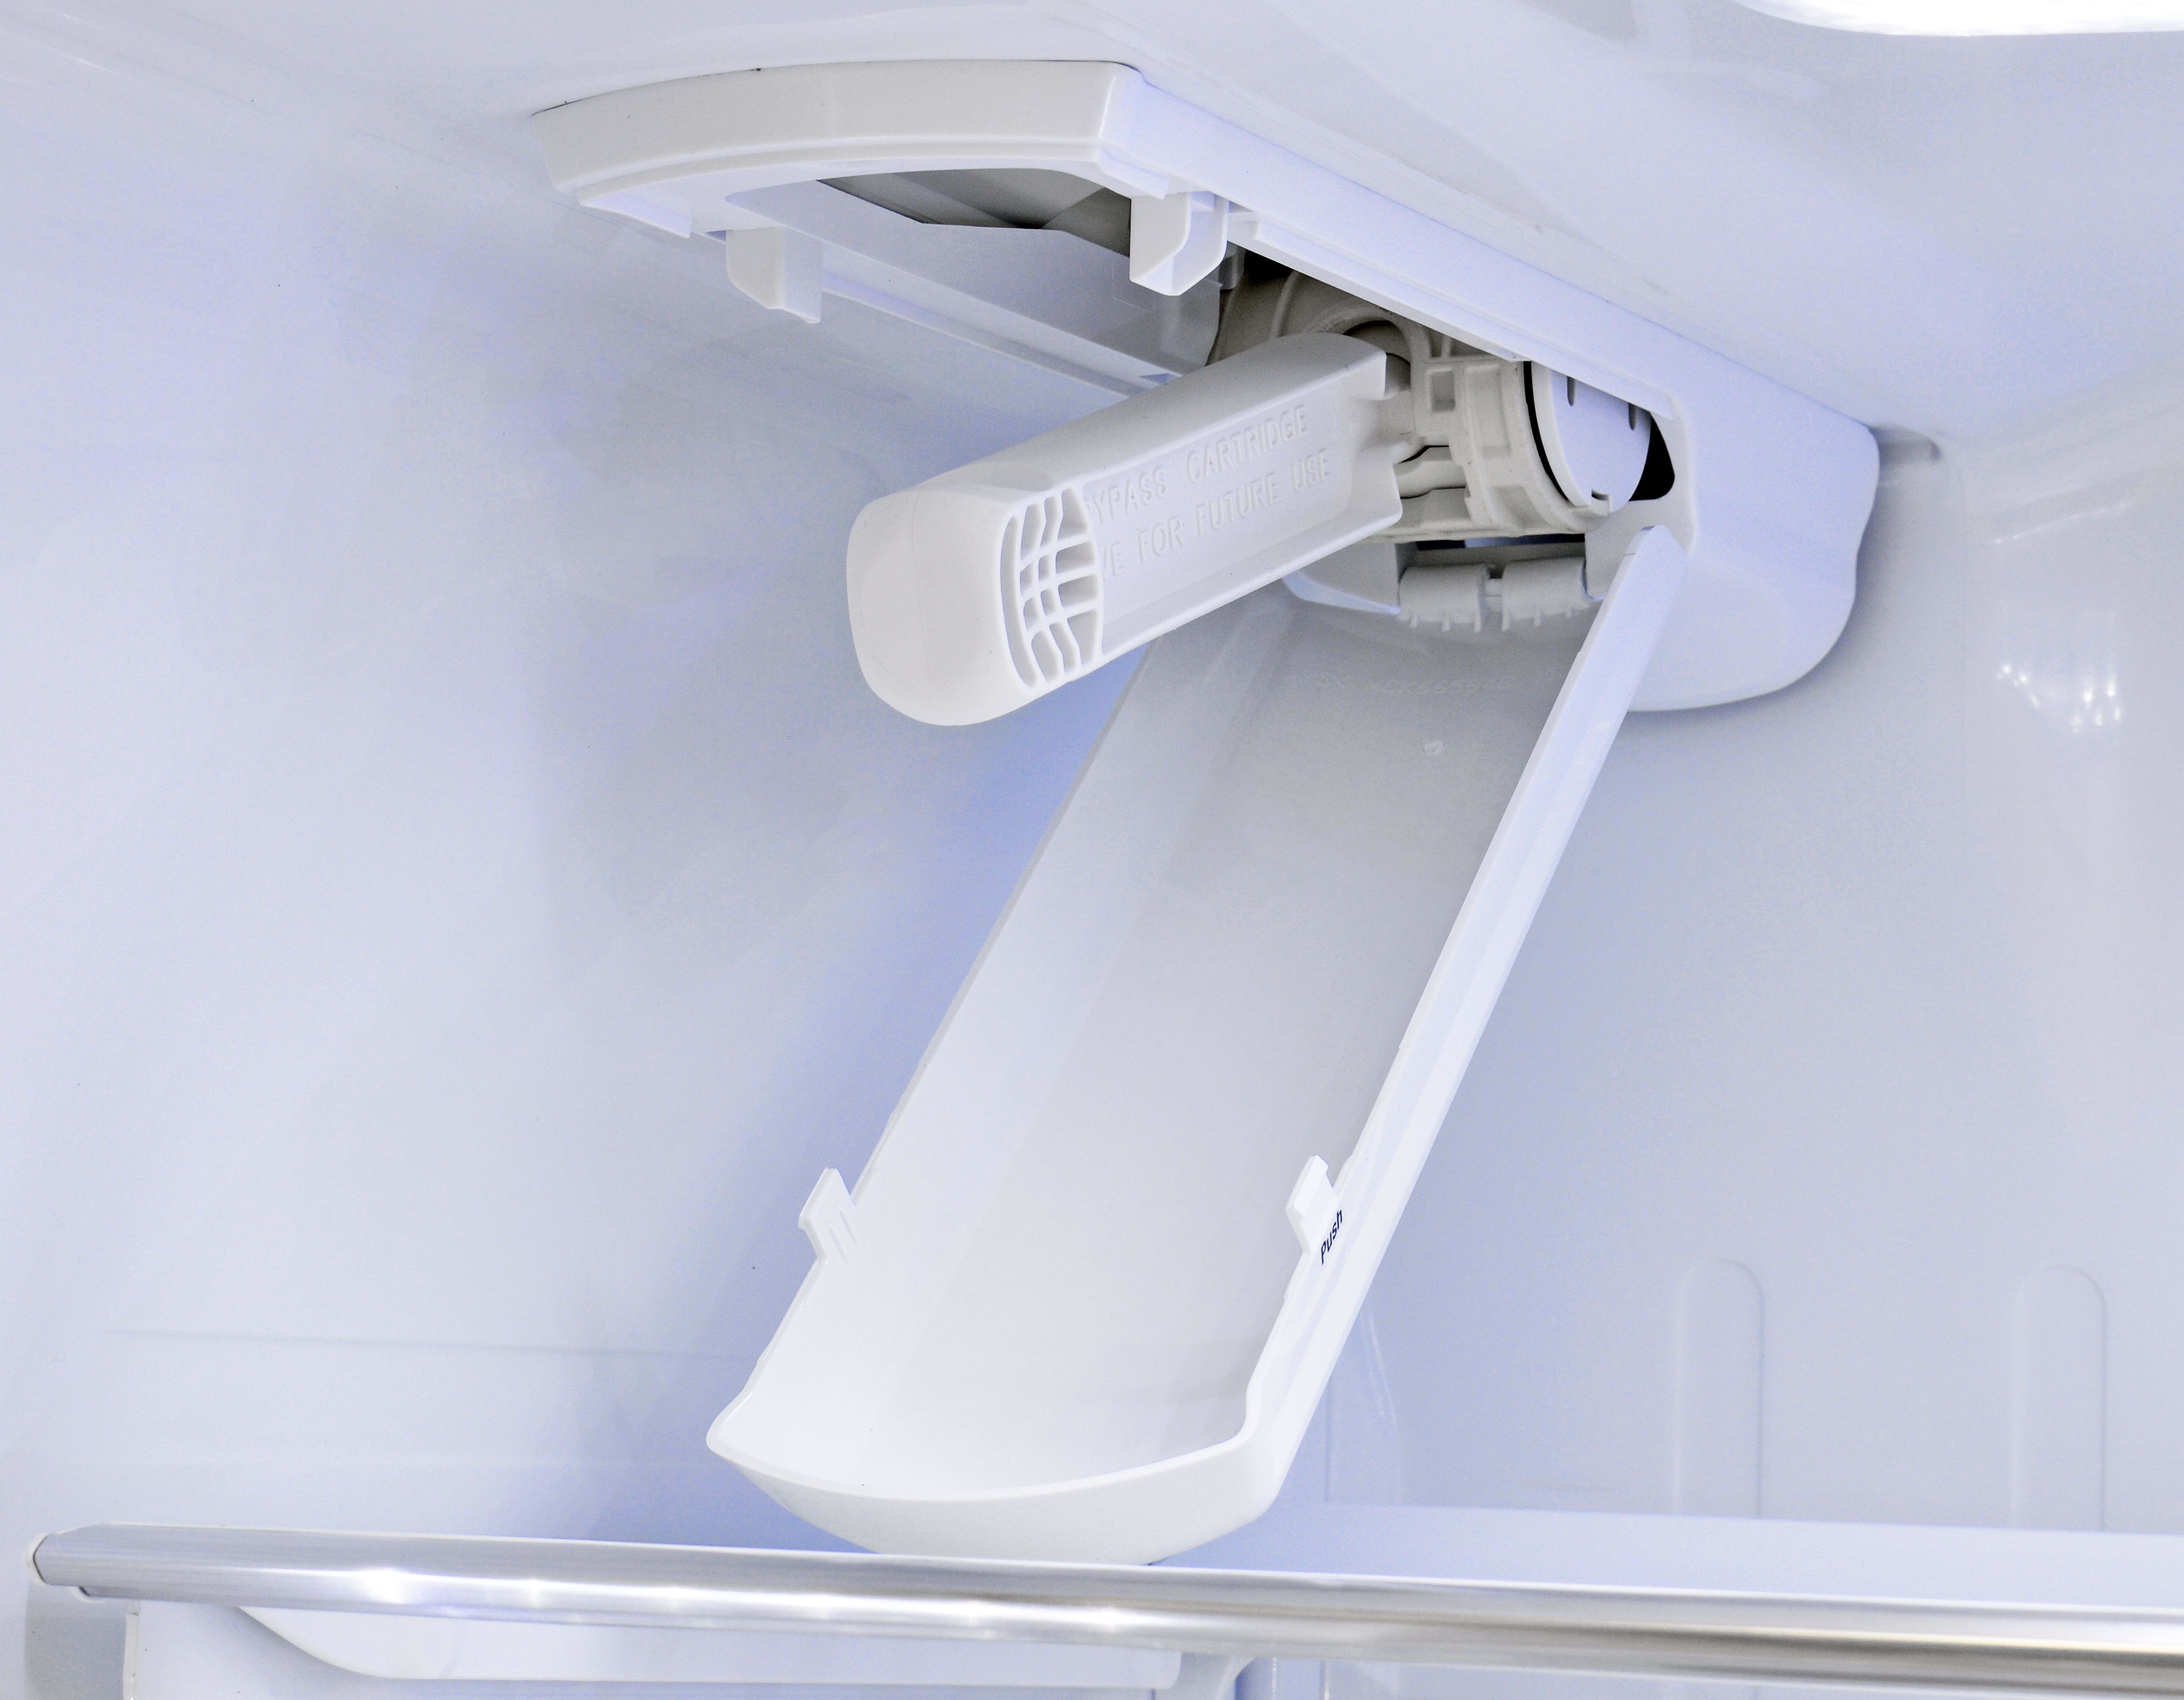 Kenmore Pro 79993 Counter Depth Refrigerator Review